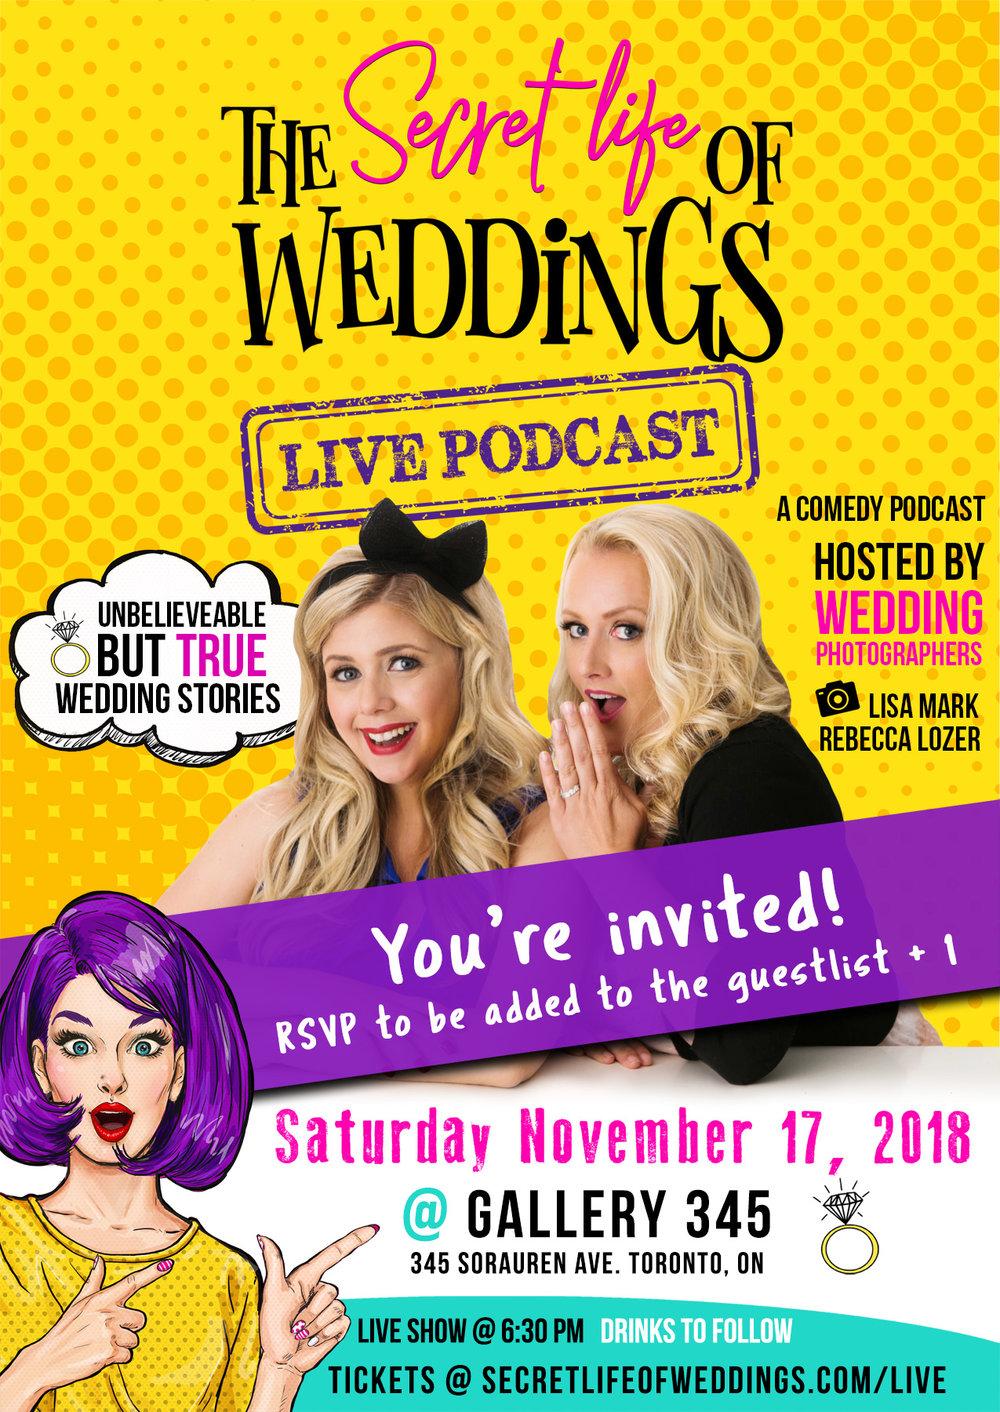 GuestlistInvite_LiveShow_Poster_-Contest-TheSecretLifeofWeddings_NegativeSpace.jpg